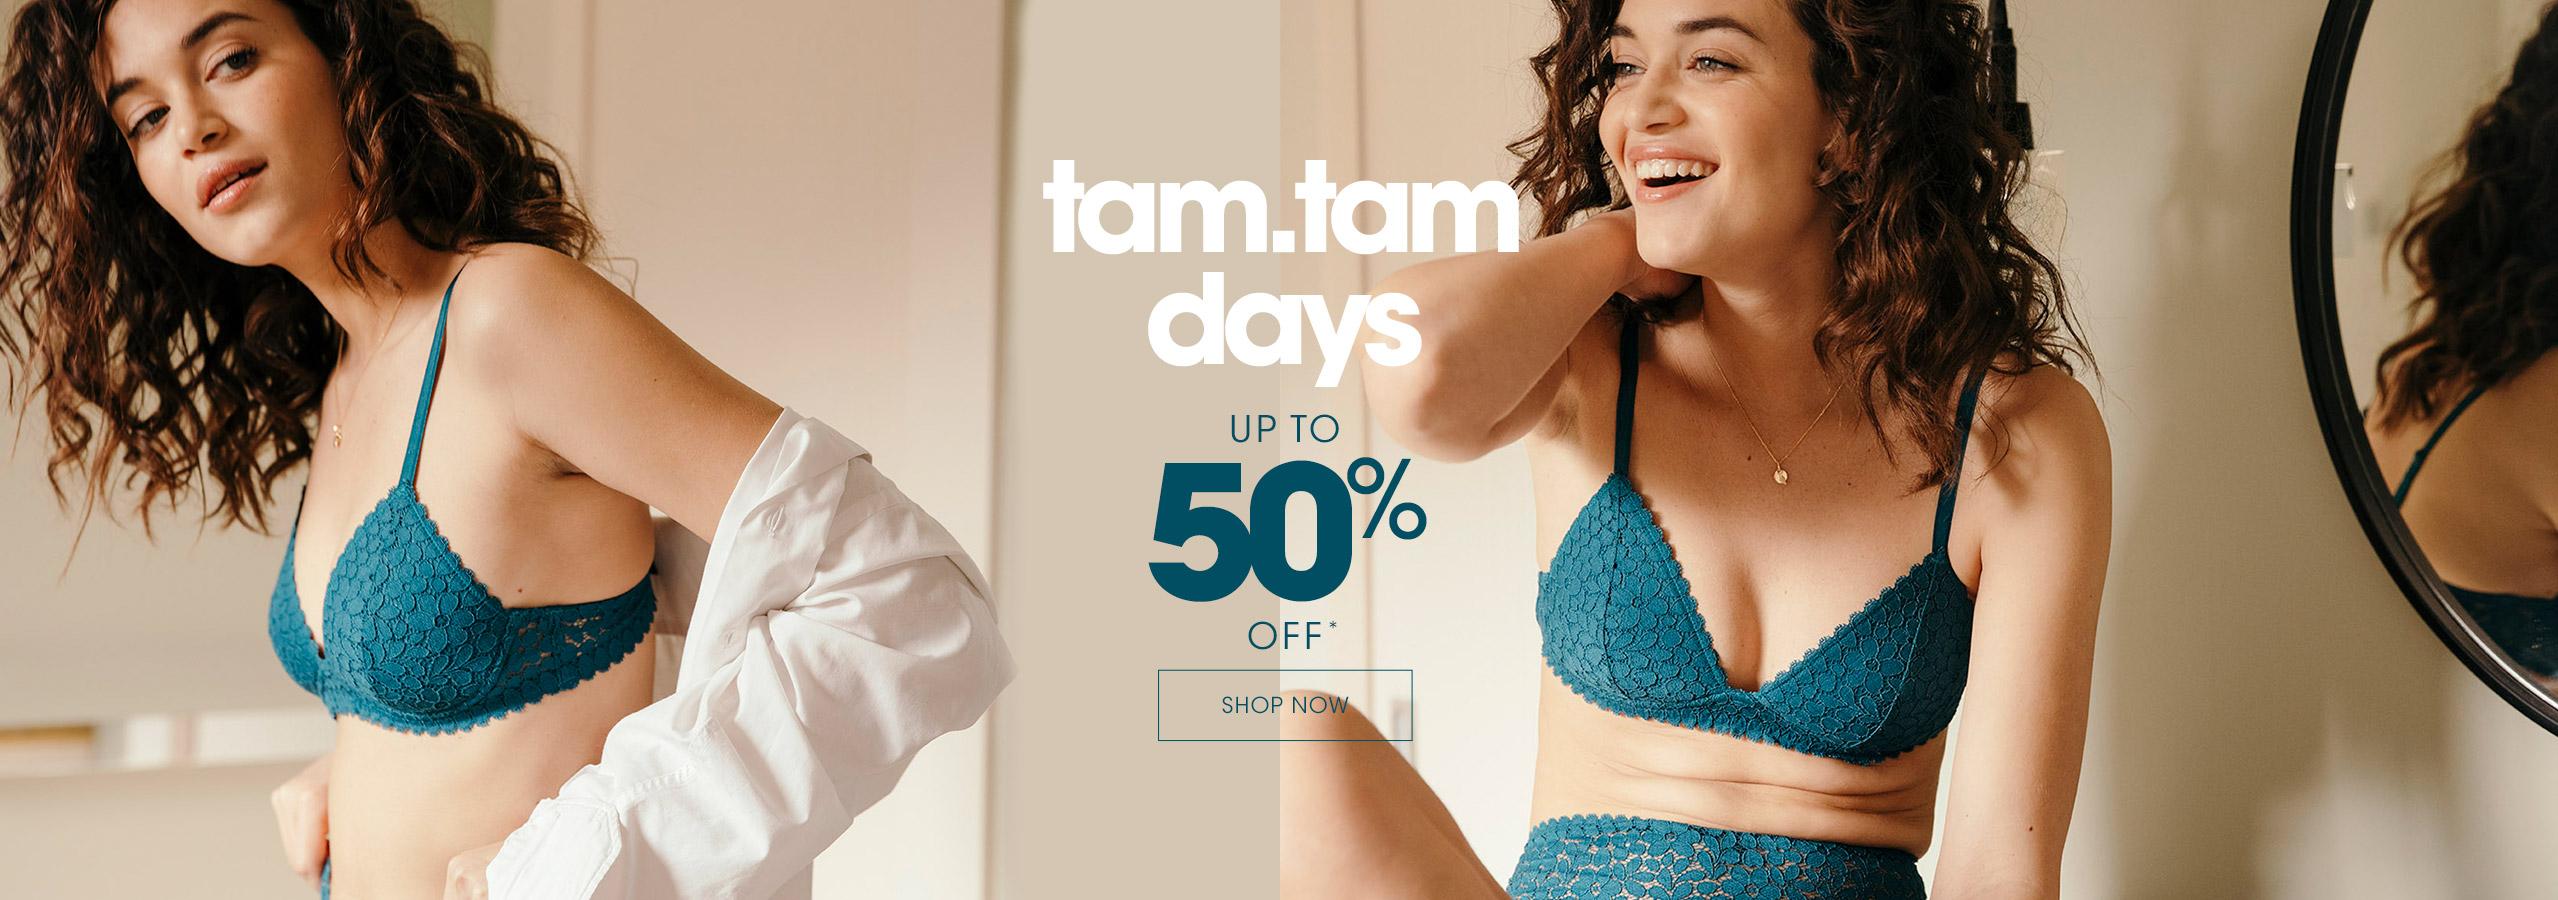 Tam.tam days : up to 50% off